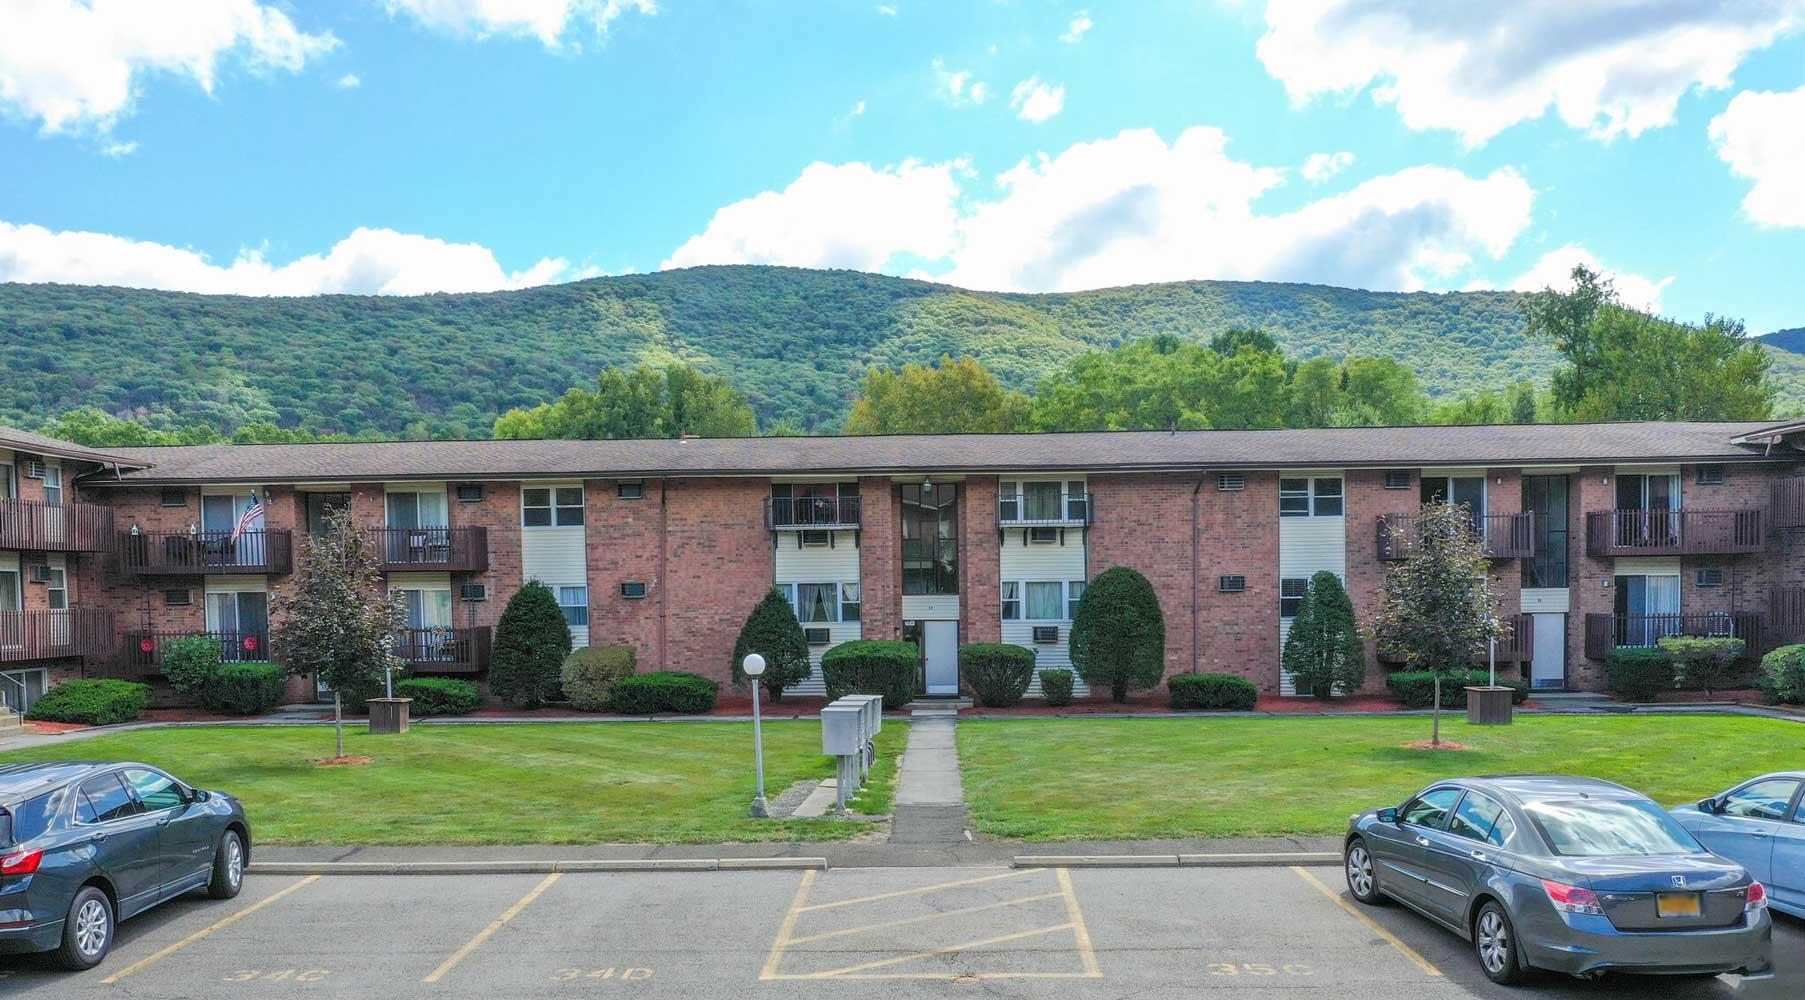 24 Hour Availability at Mountainview Gardens Apartments in Fishkill, NY